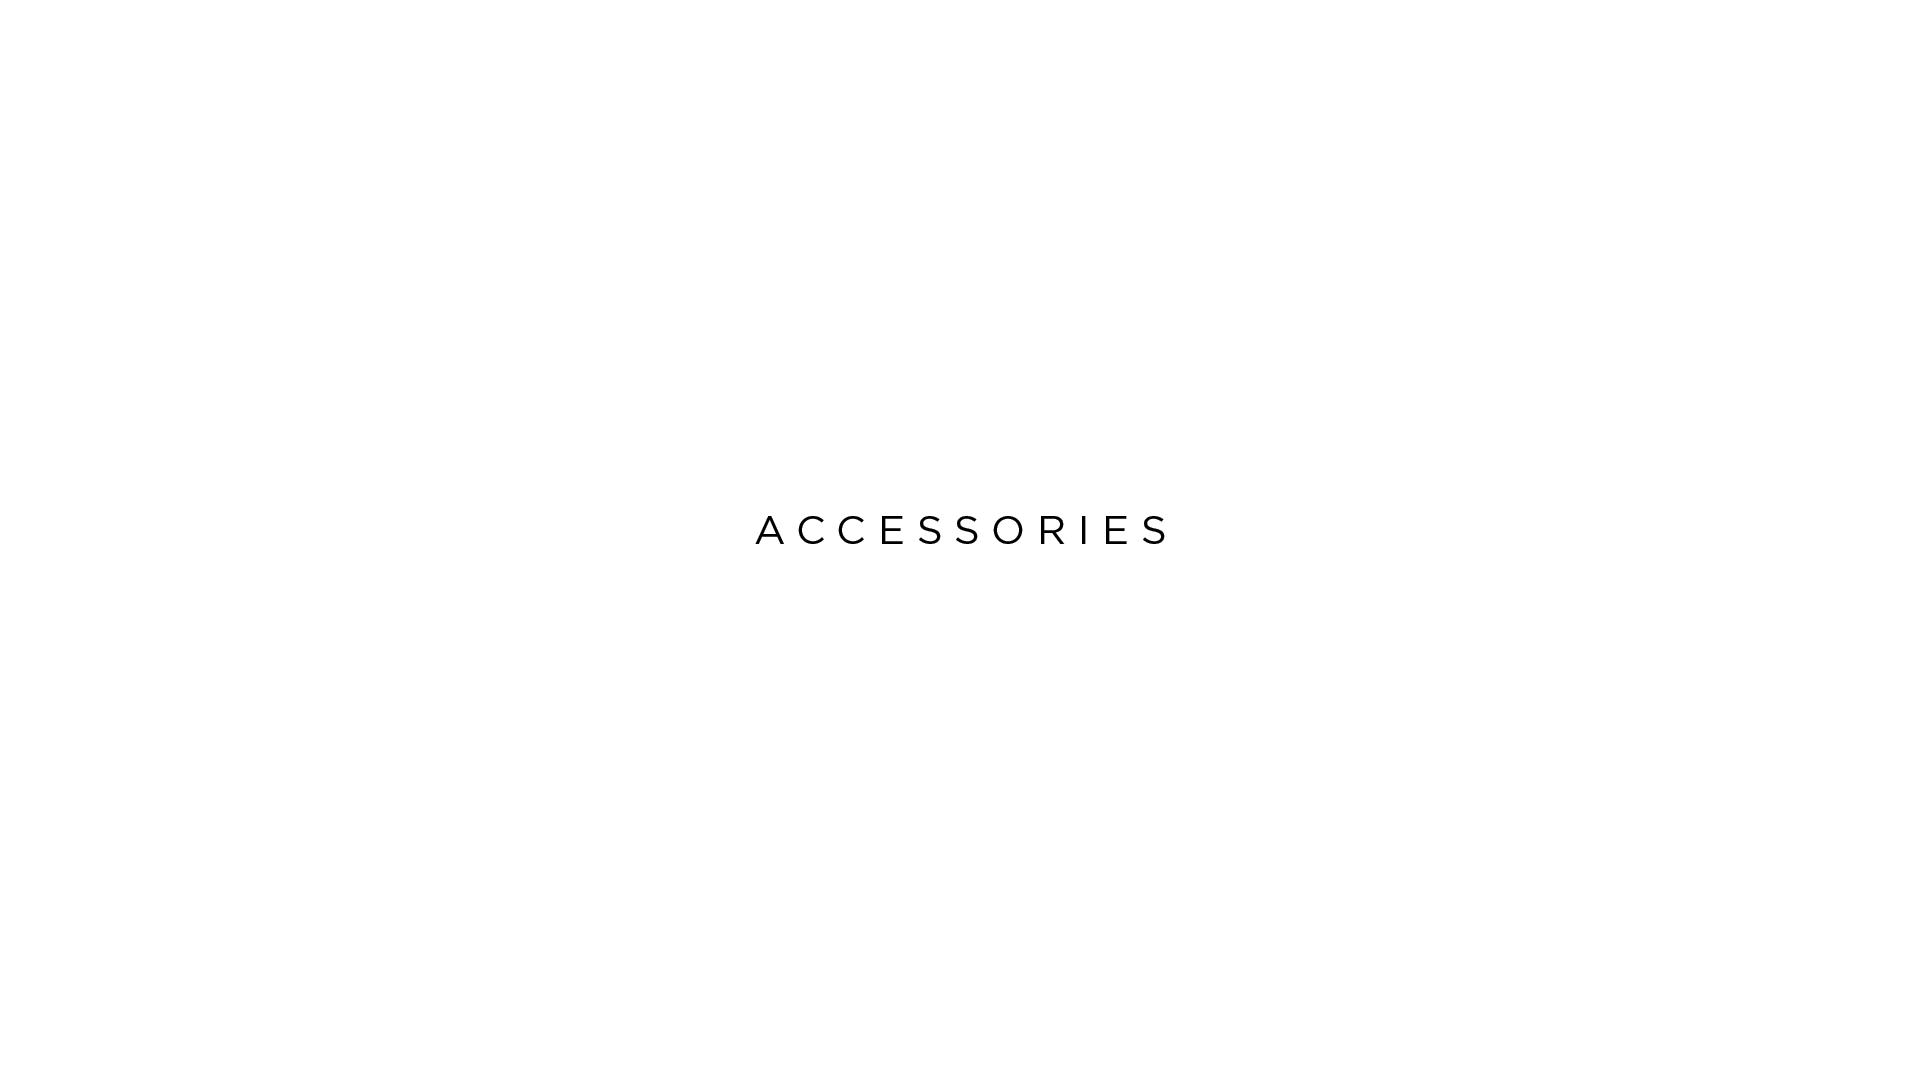 Accessories 2